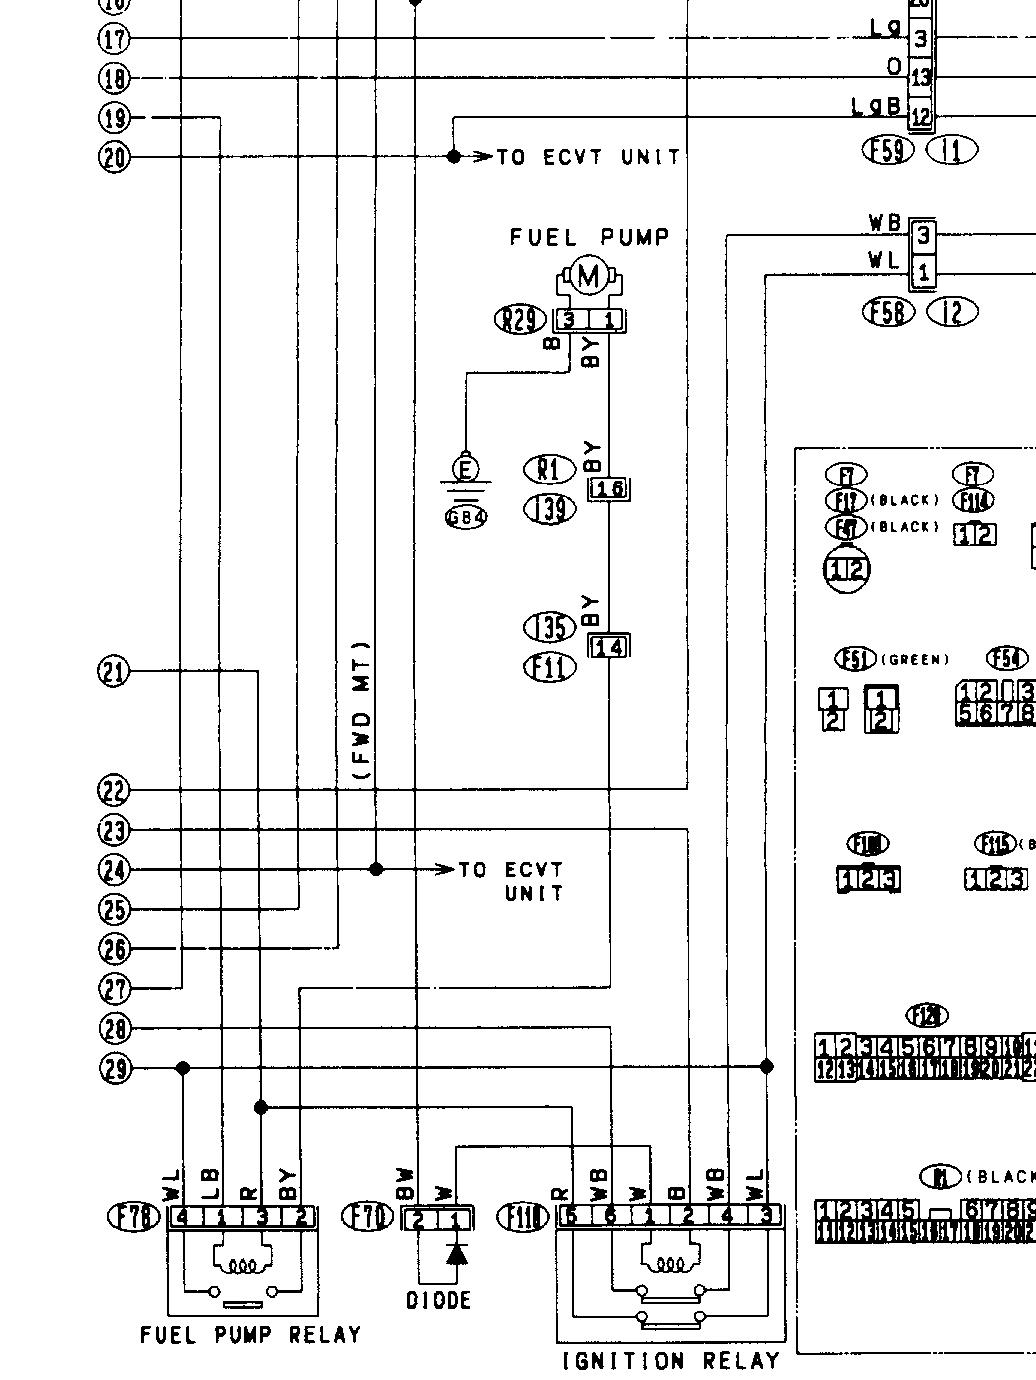 subaru wrx wiring diagram msd 3 step cam free engine image for user